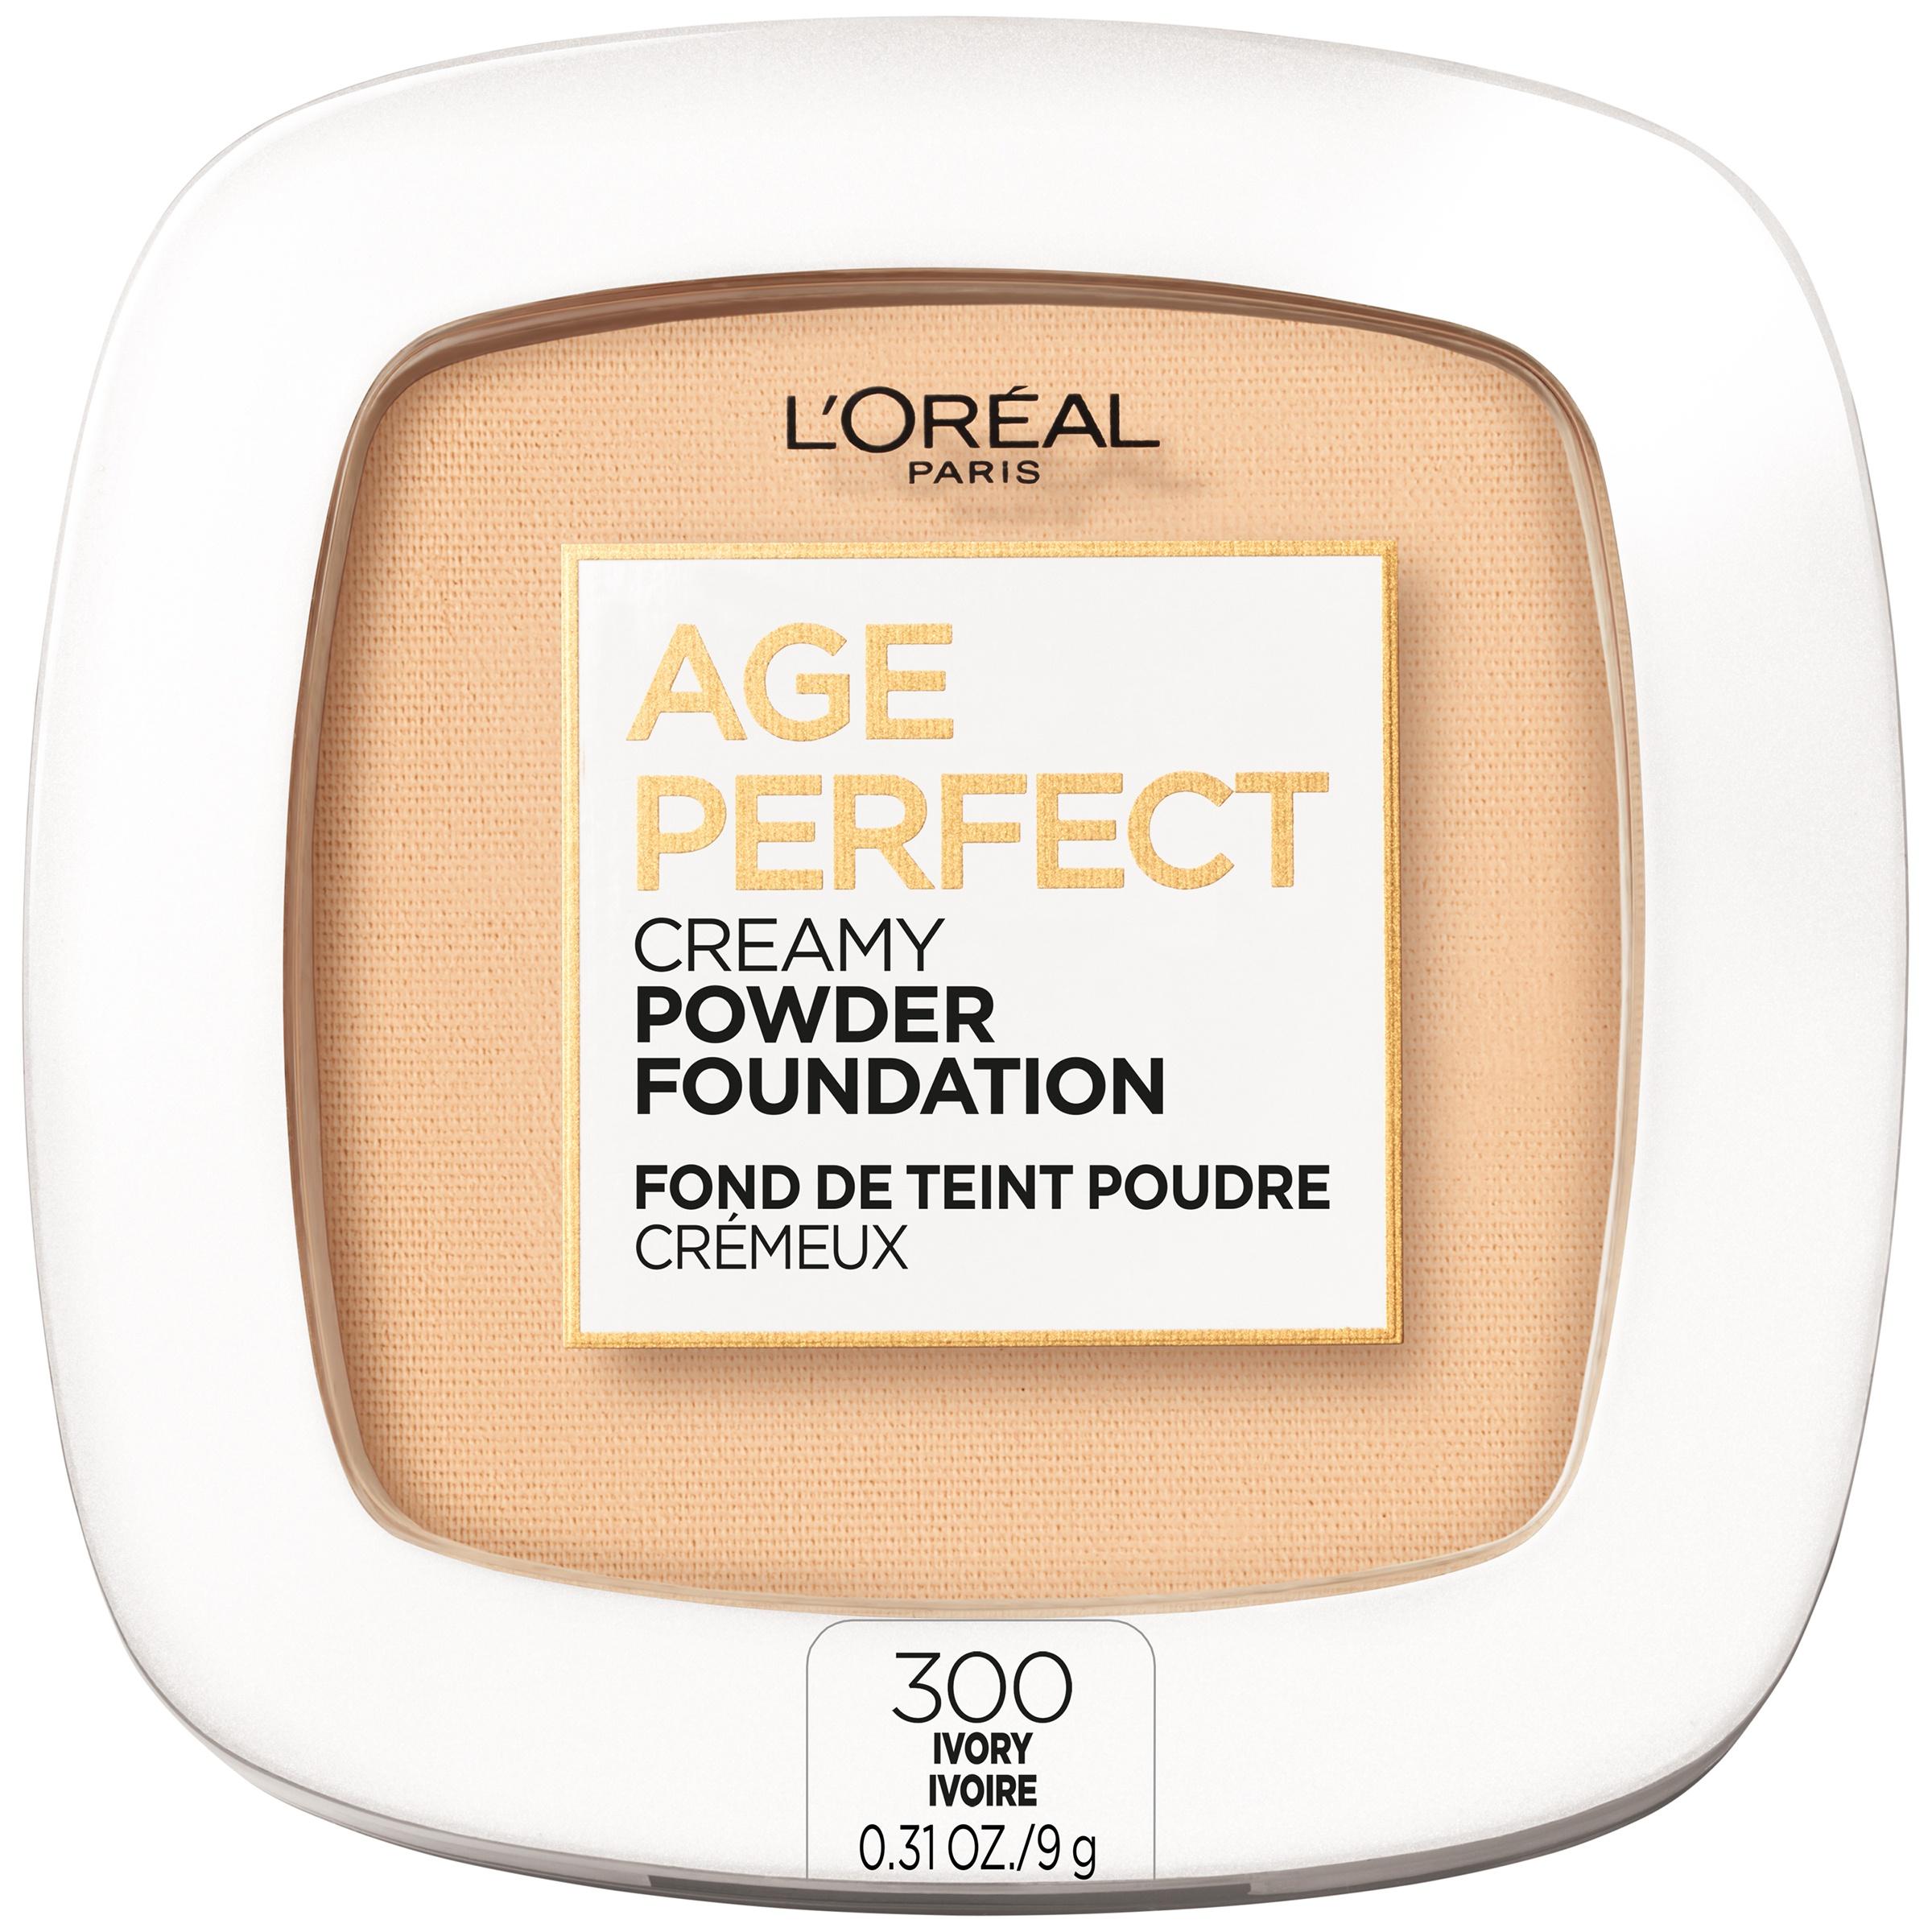 L'Oreal Age Perfect Creamy Powder Foundation